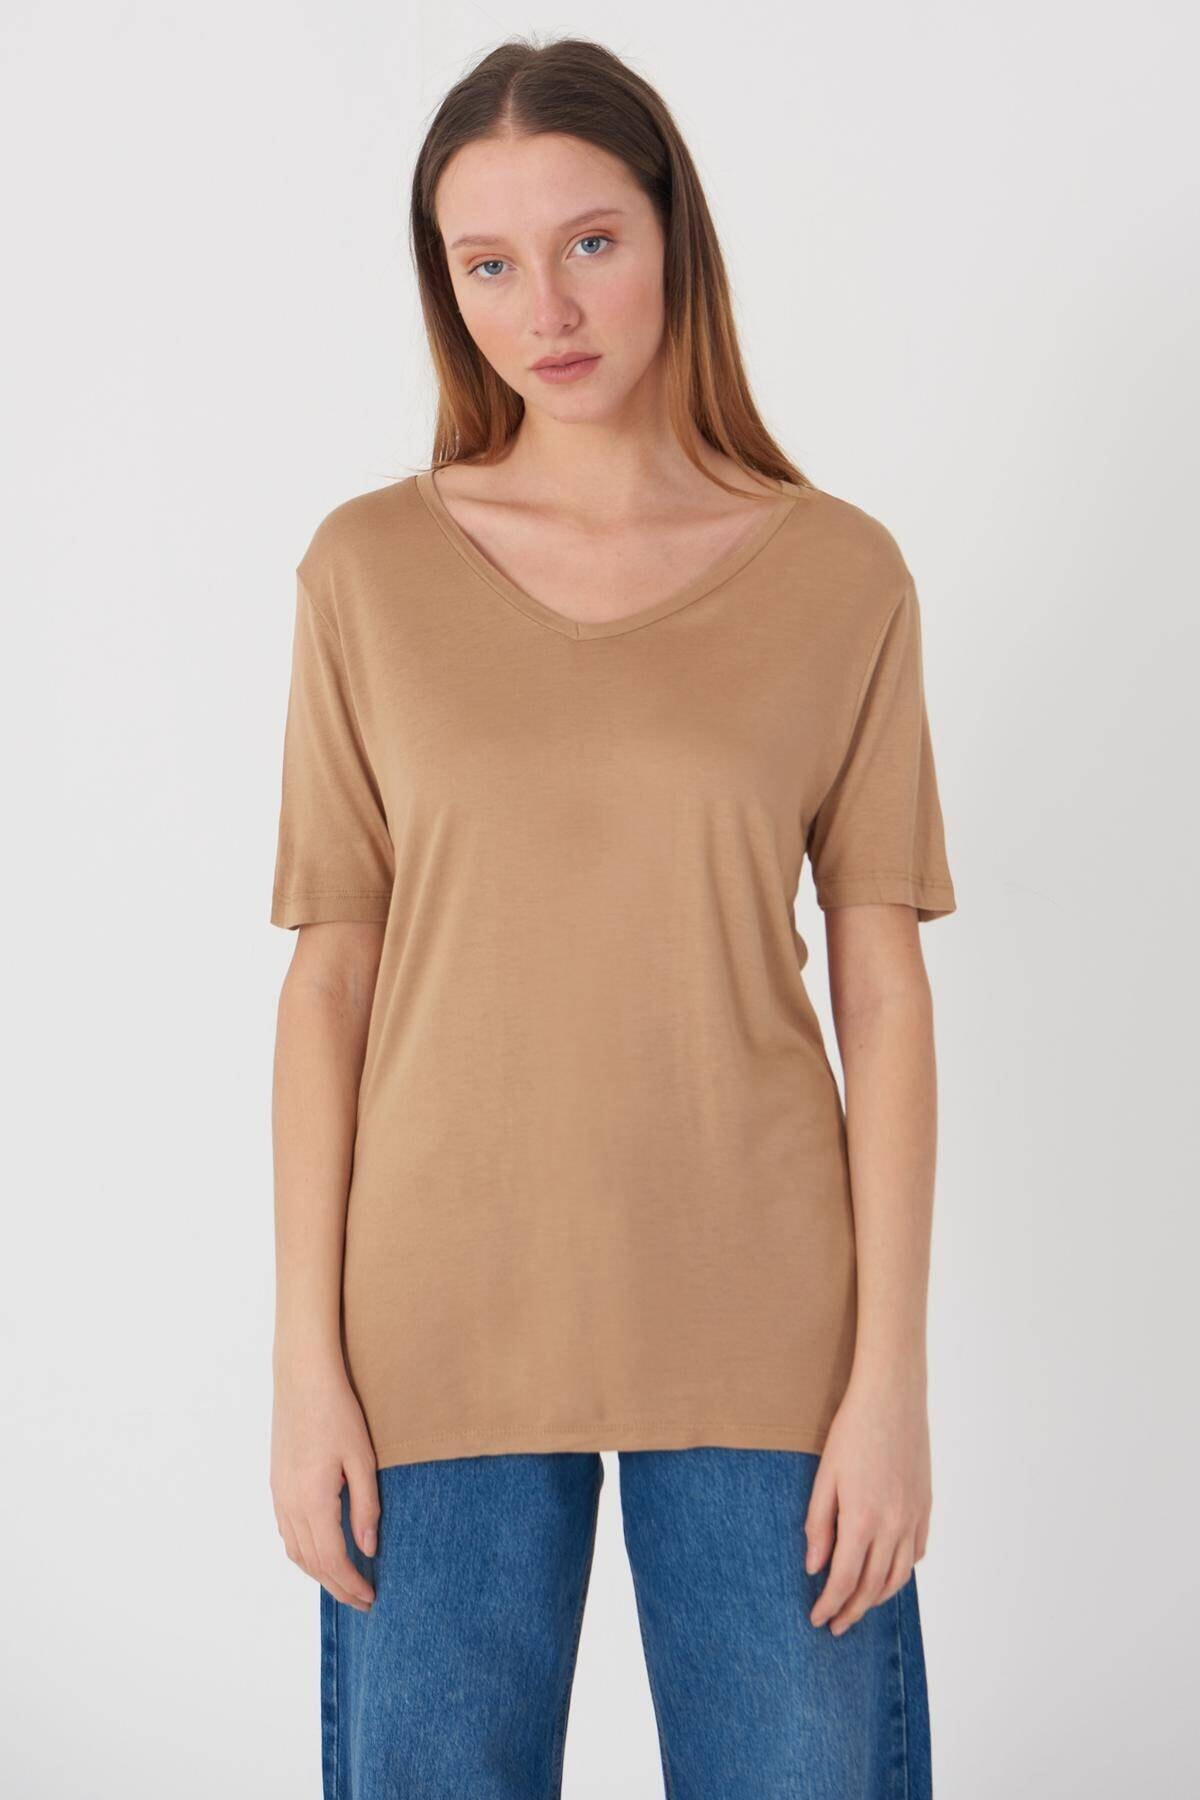 Addax Kadın Camel V Yaka T-Shirt B0225 - L7L8 Adx-00008886 2